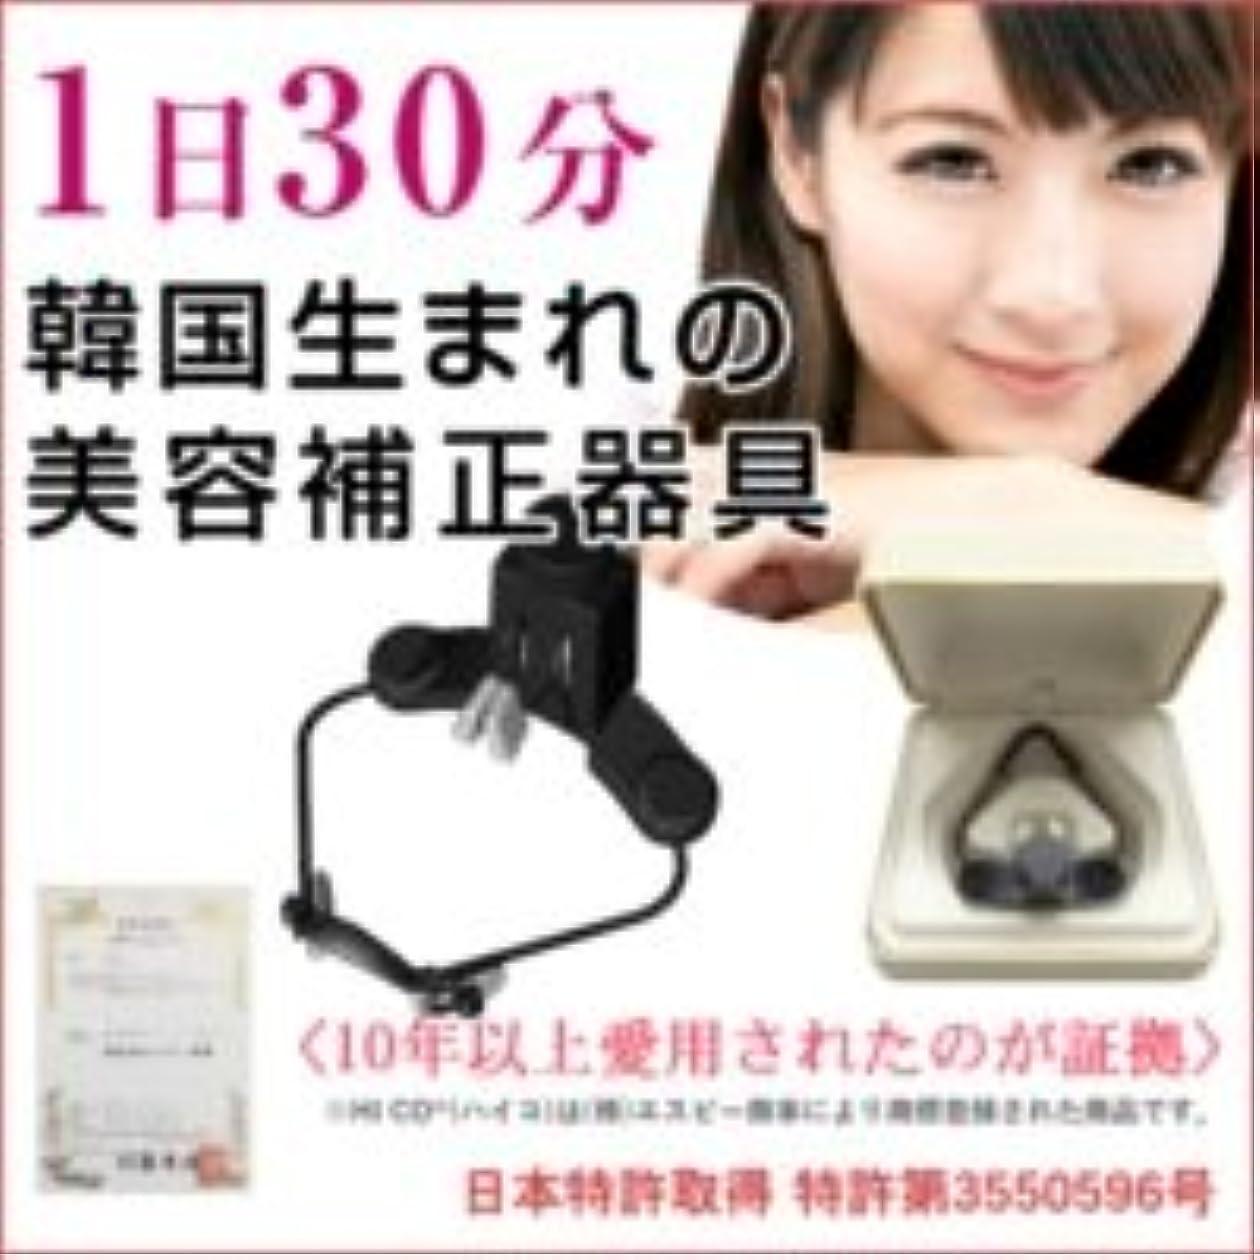 批判的行政推進力ハイコ (HICO) 美鼻補整器具